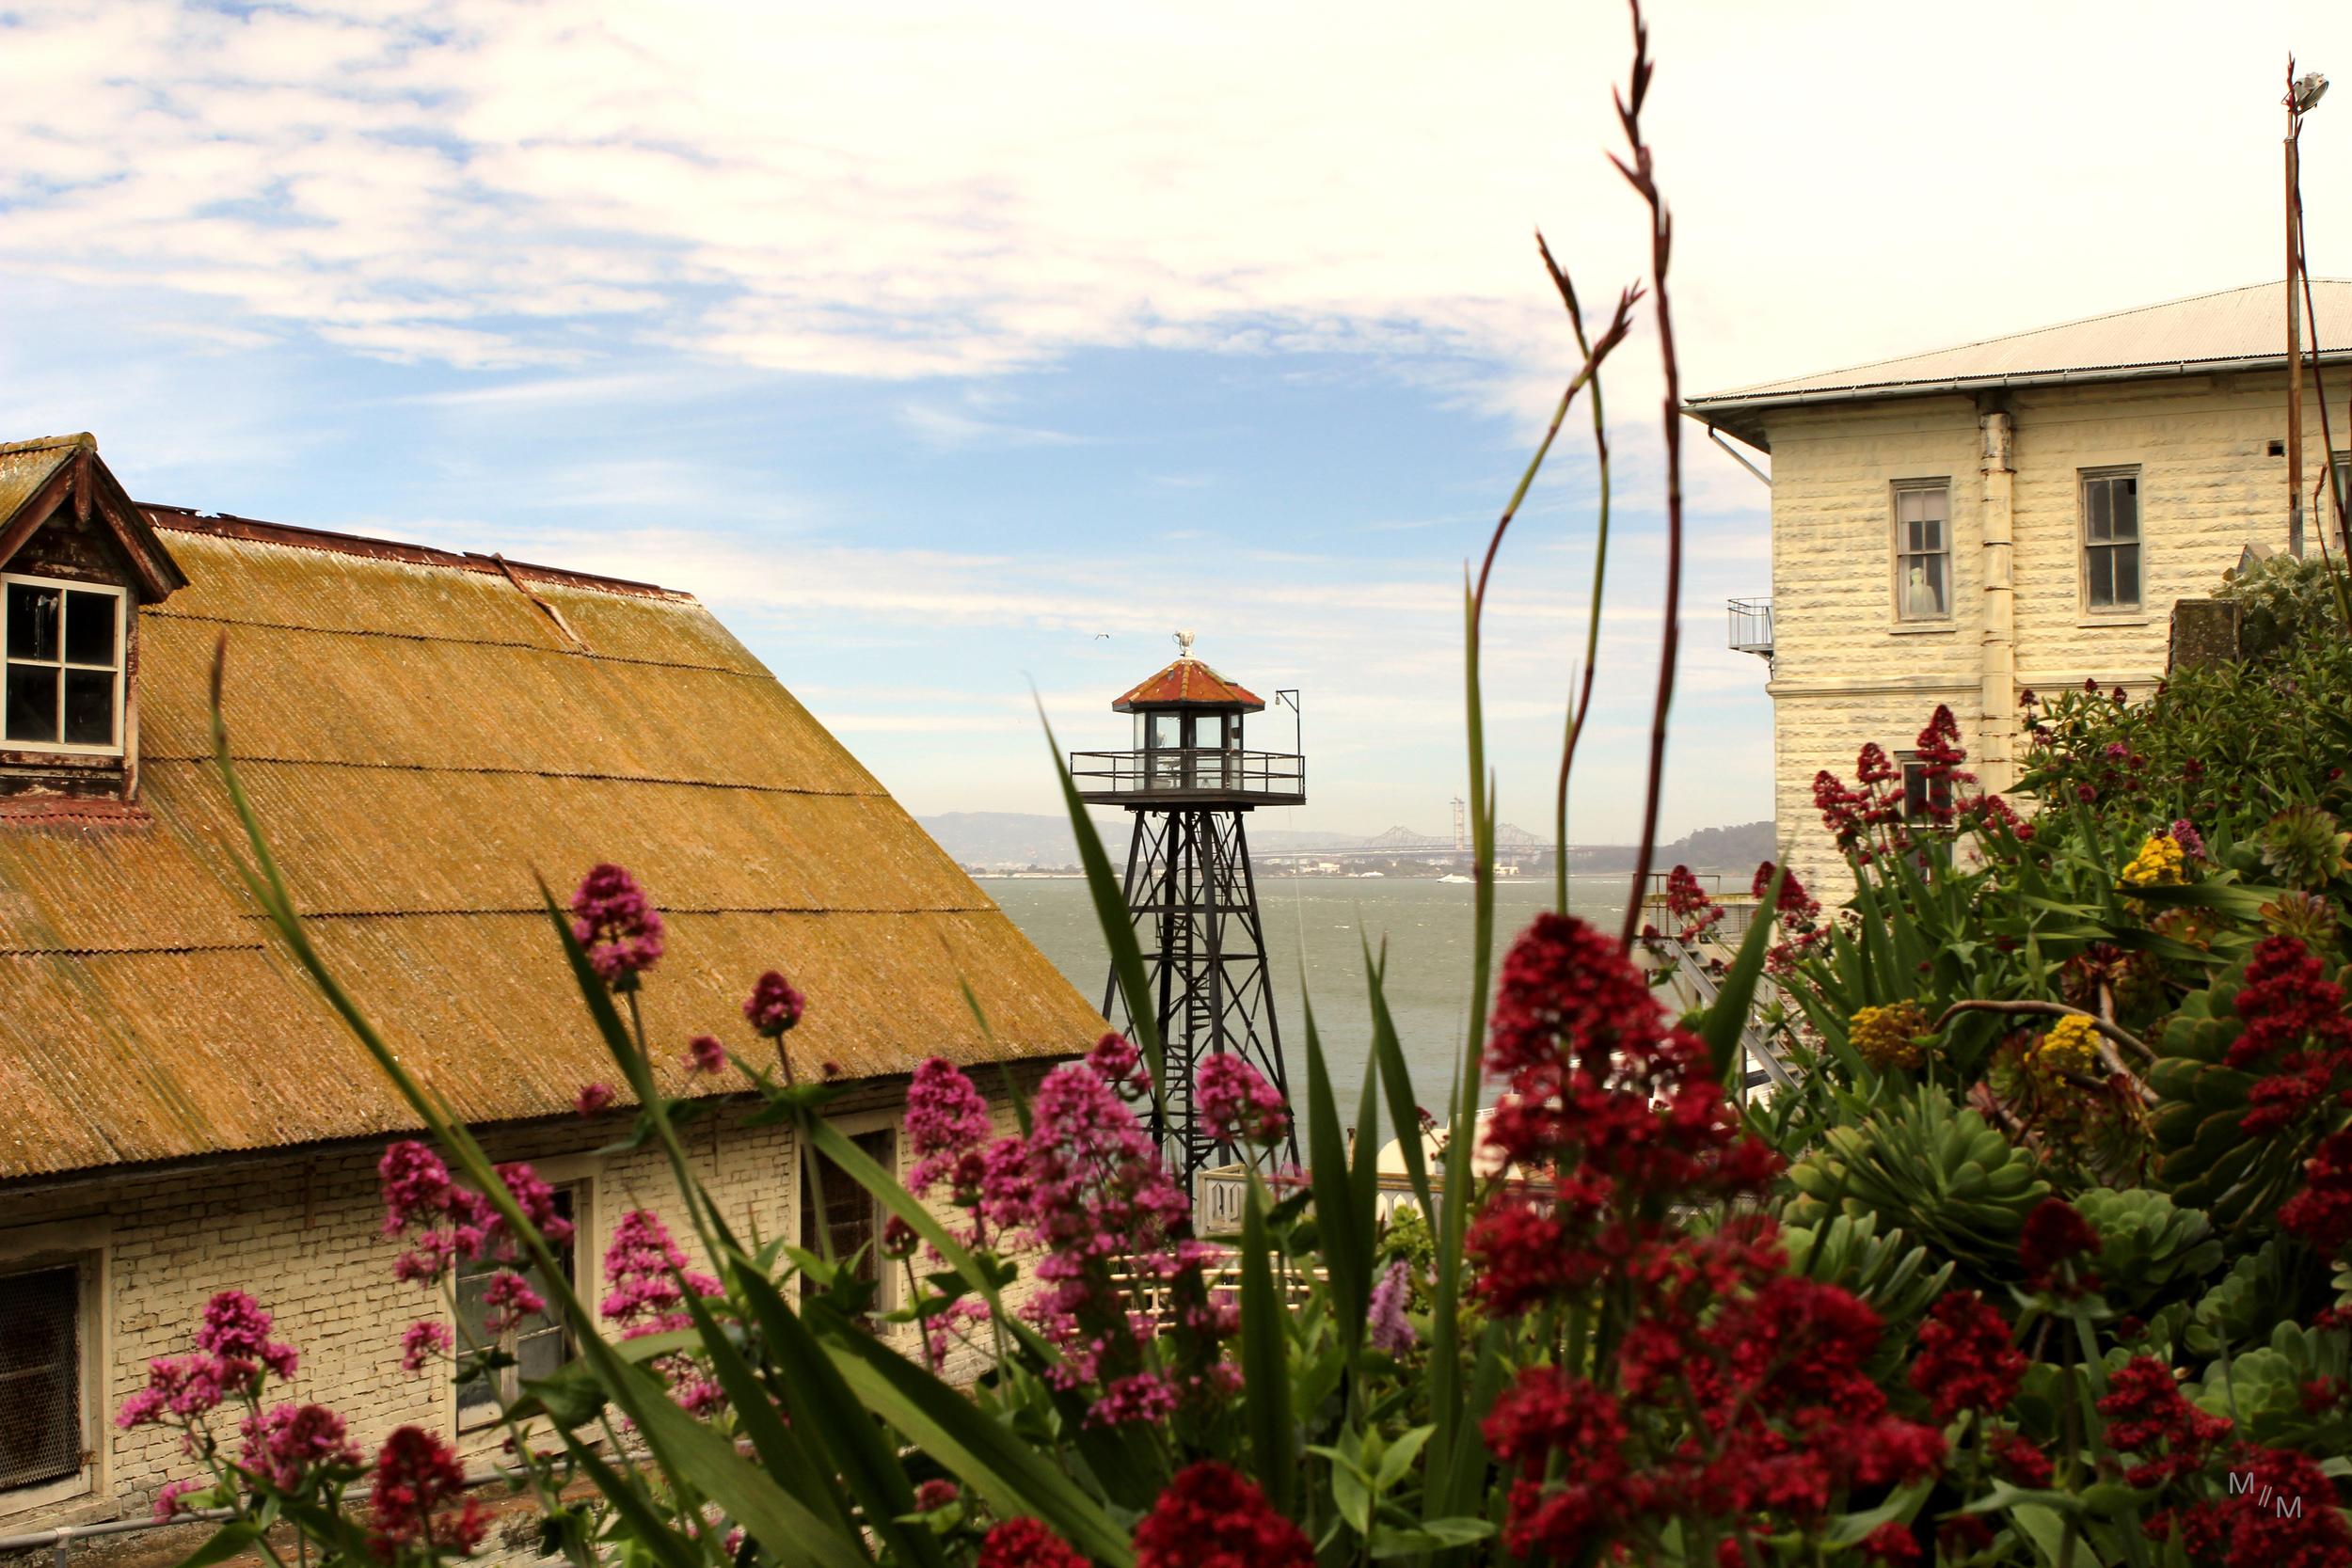 guardtower_flowers copy.jpg